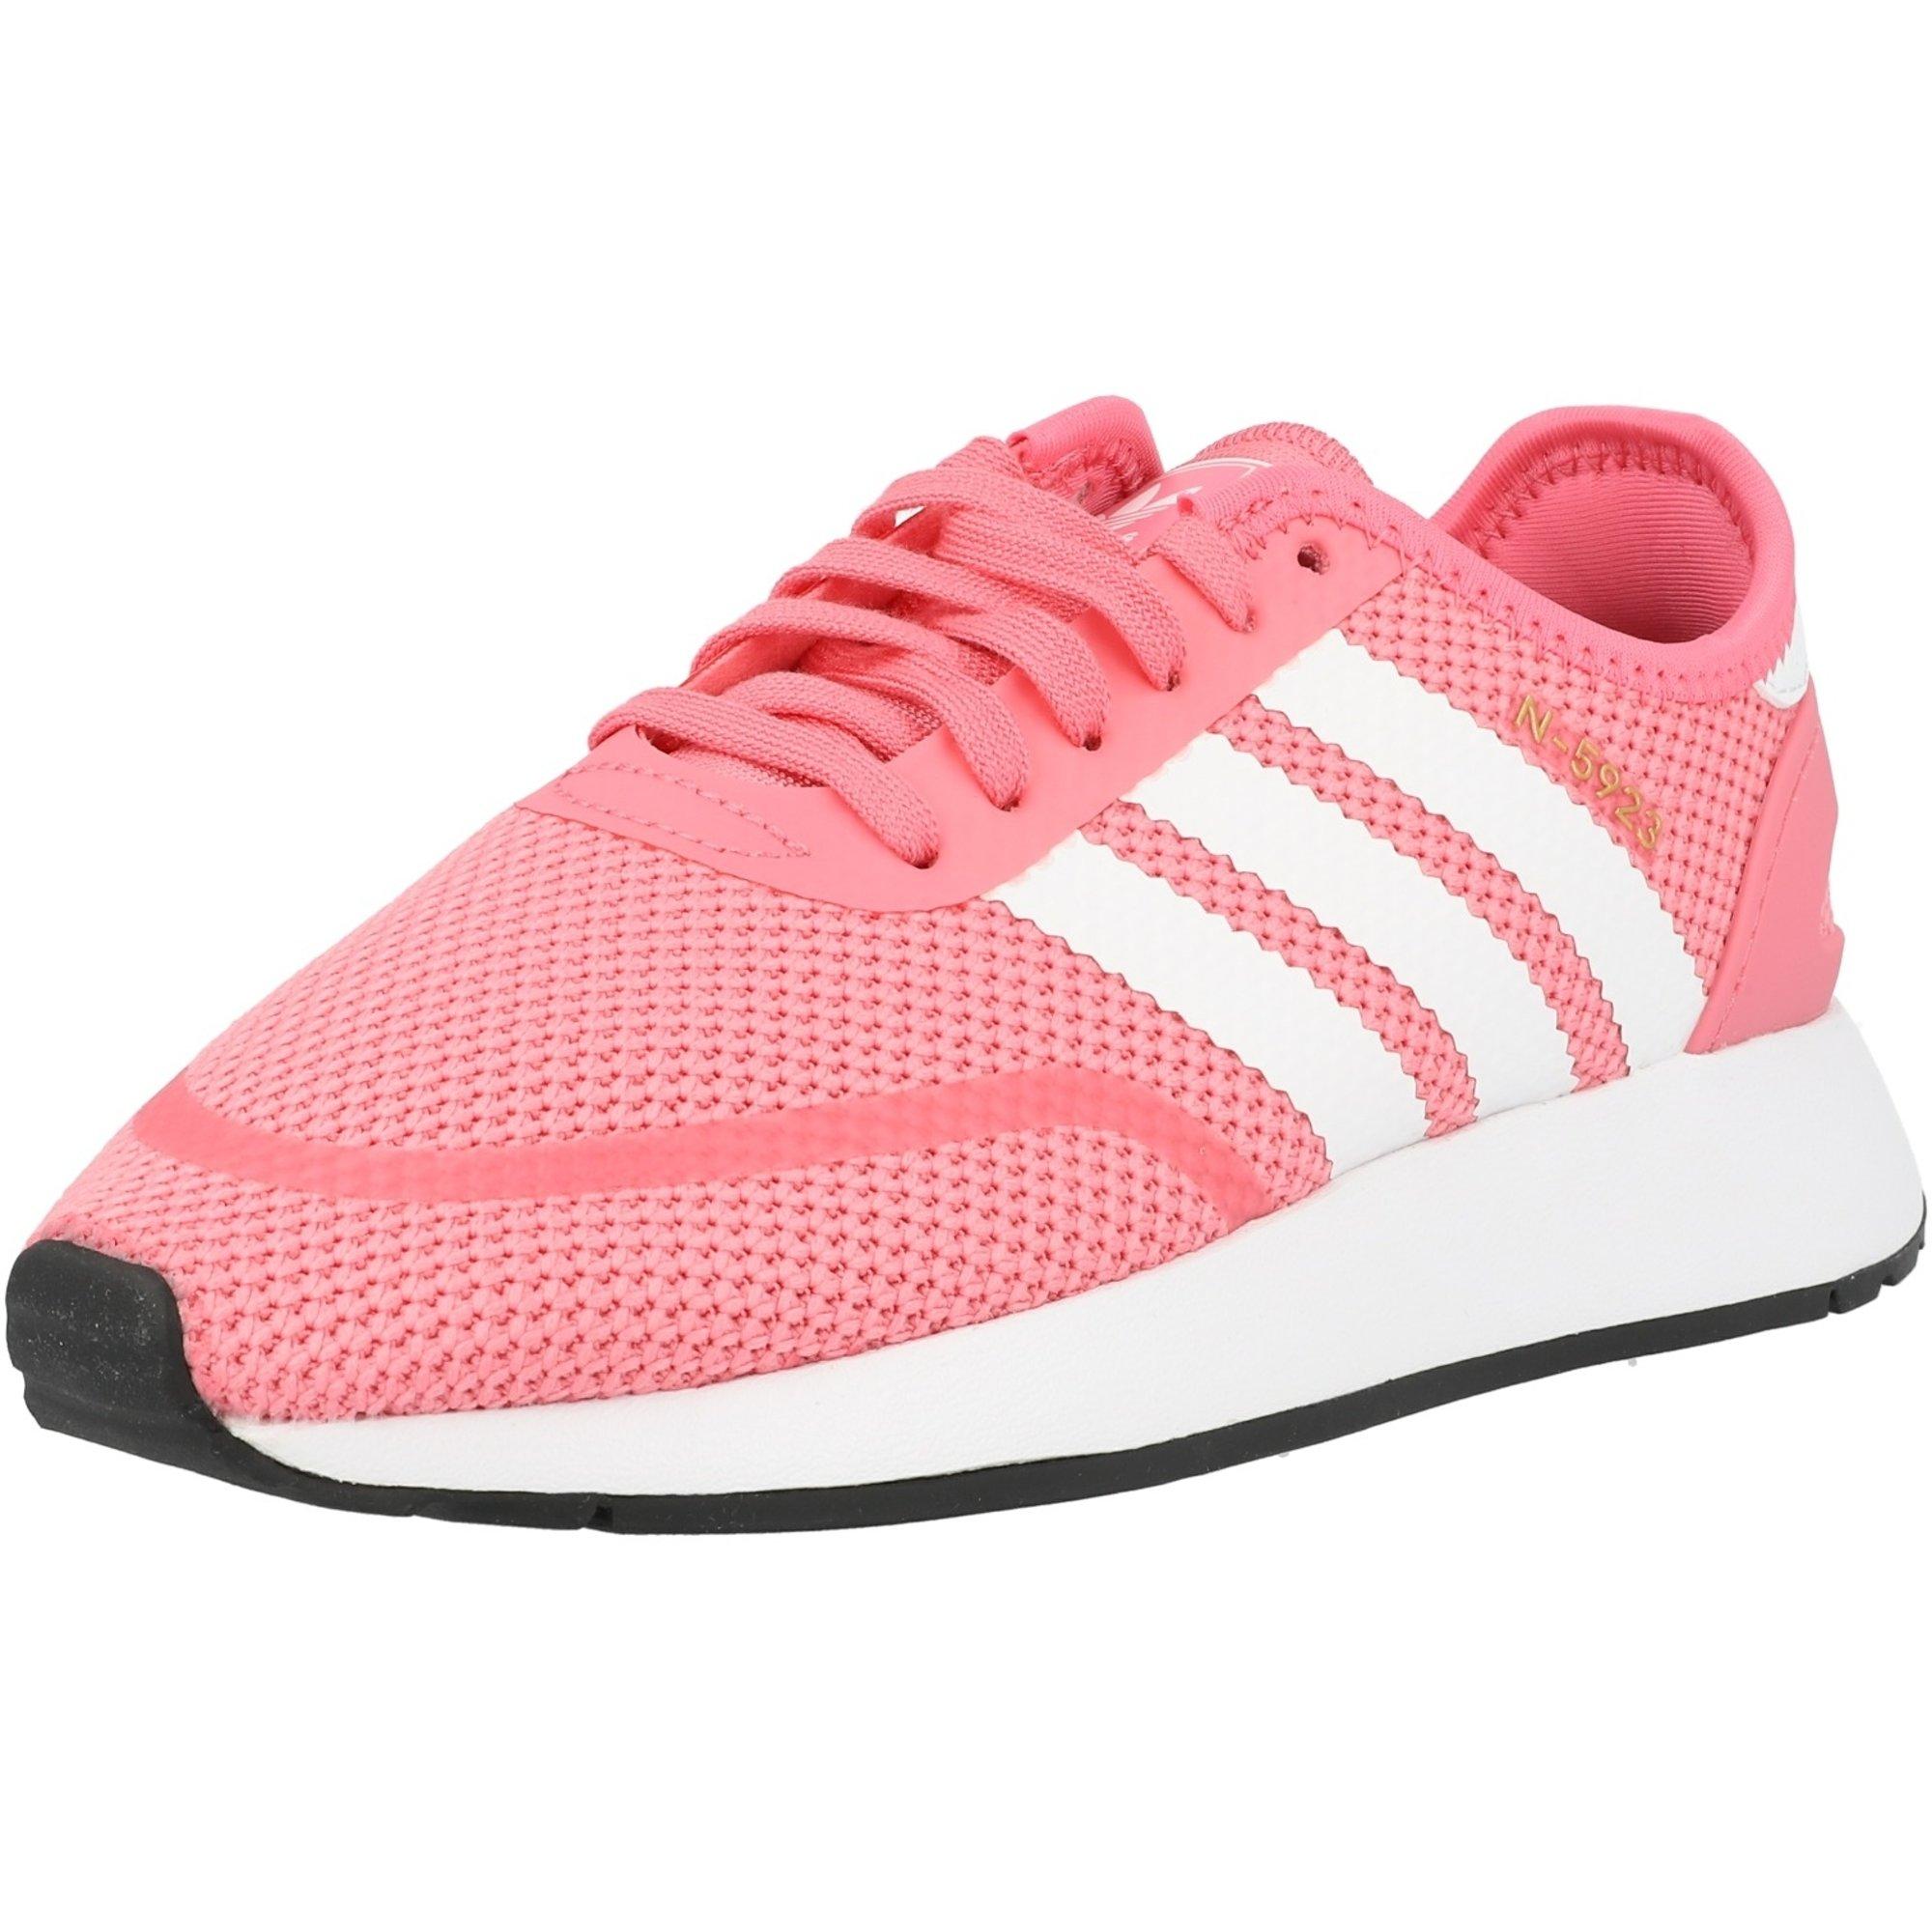 adidas Originals N 5923 J Kreide Pink Textil Jugend